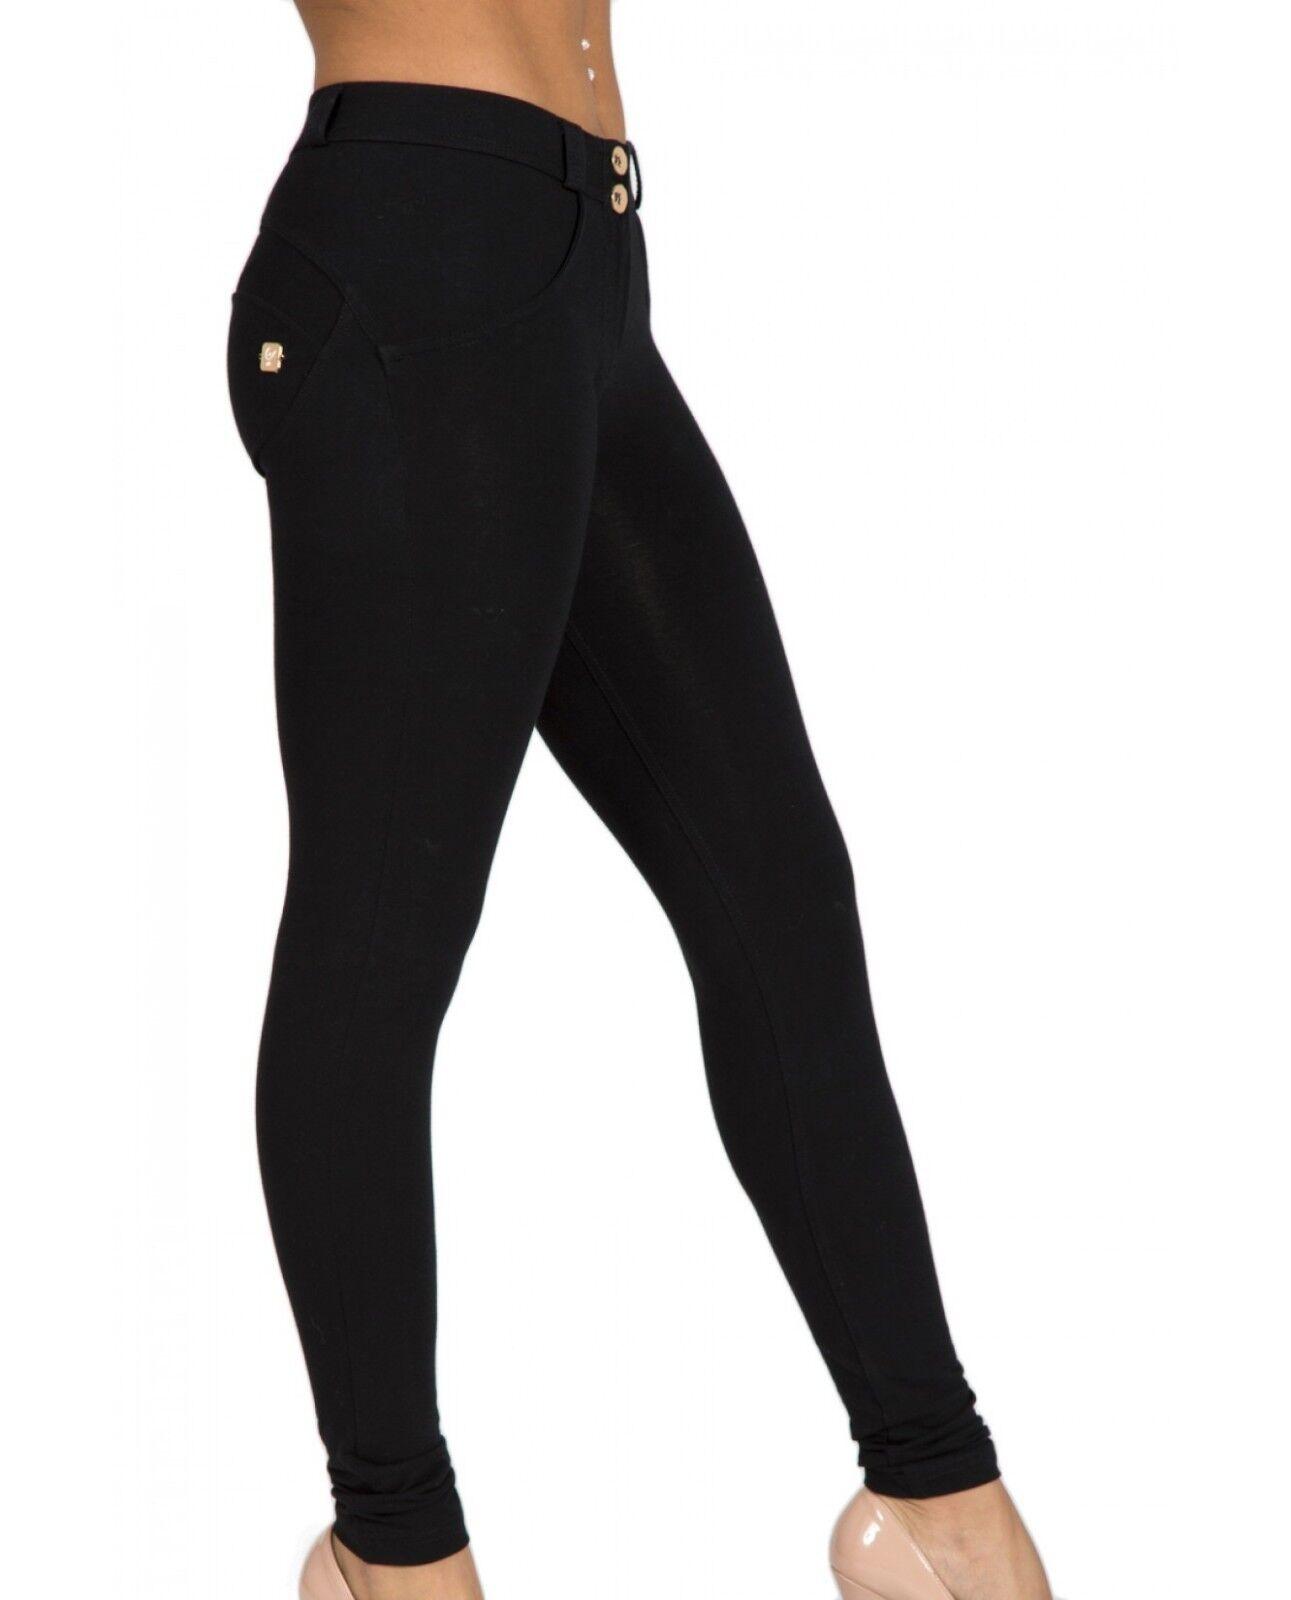 Frotdy Woherren Woherren Woherren WR.UP® Shaping Effect Stretch Cotton Regular Rise Skinny Pant f9a5da